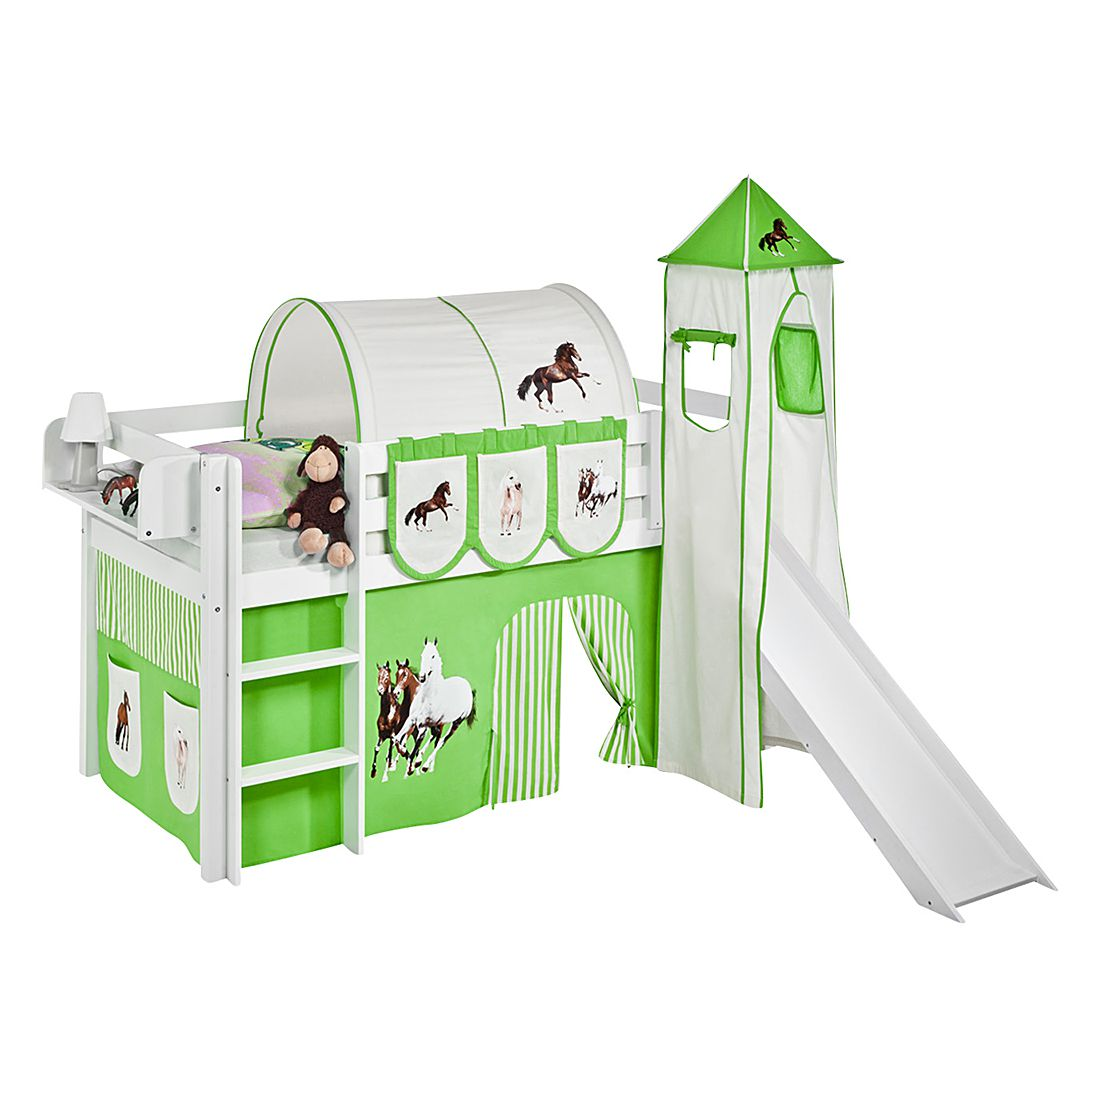 home24 Spielbett JELLE Pferde Gruen | Kinderzimmer > Kinderbetten | Weiss | Massivholz | Lilokids